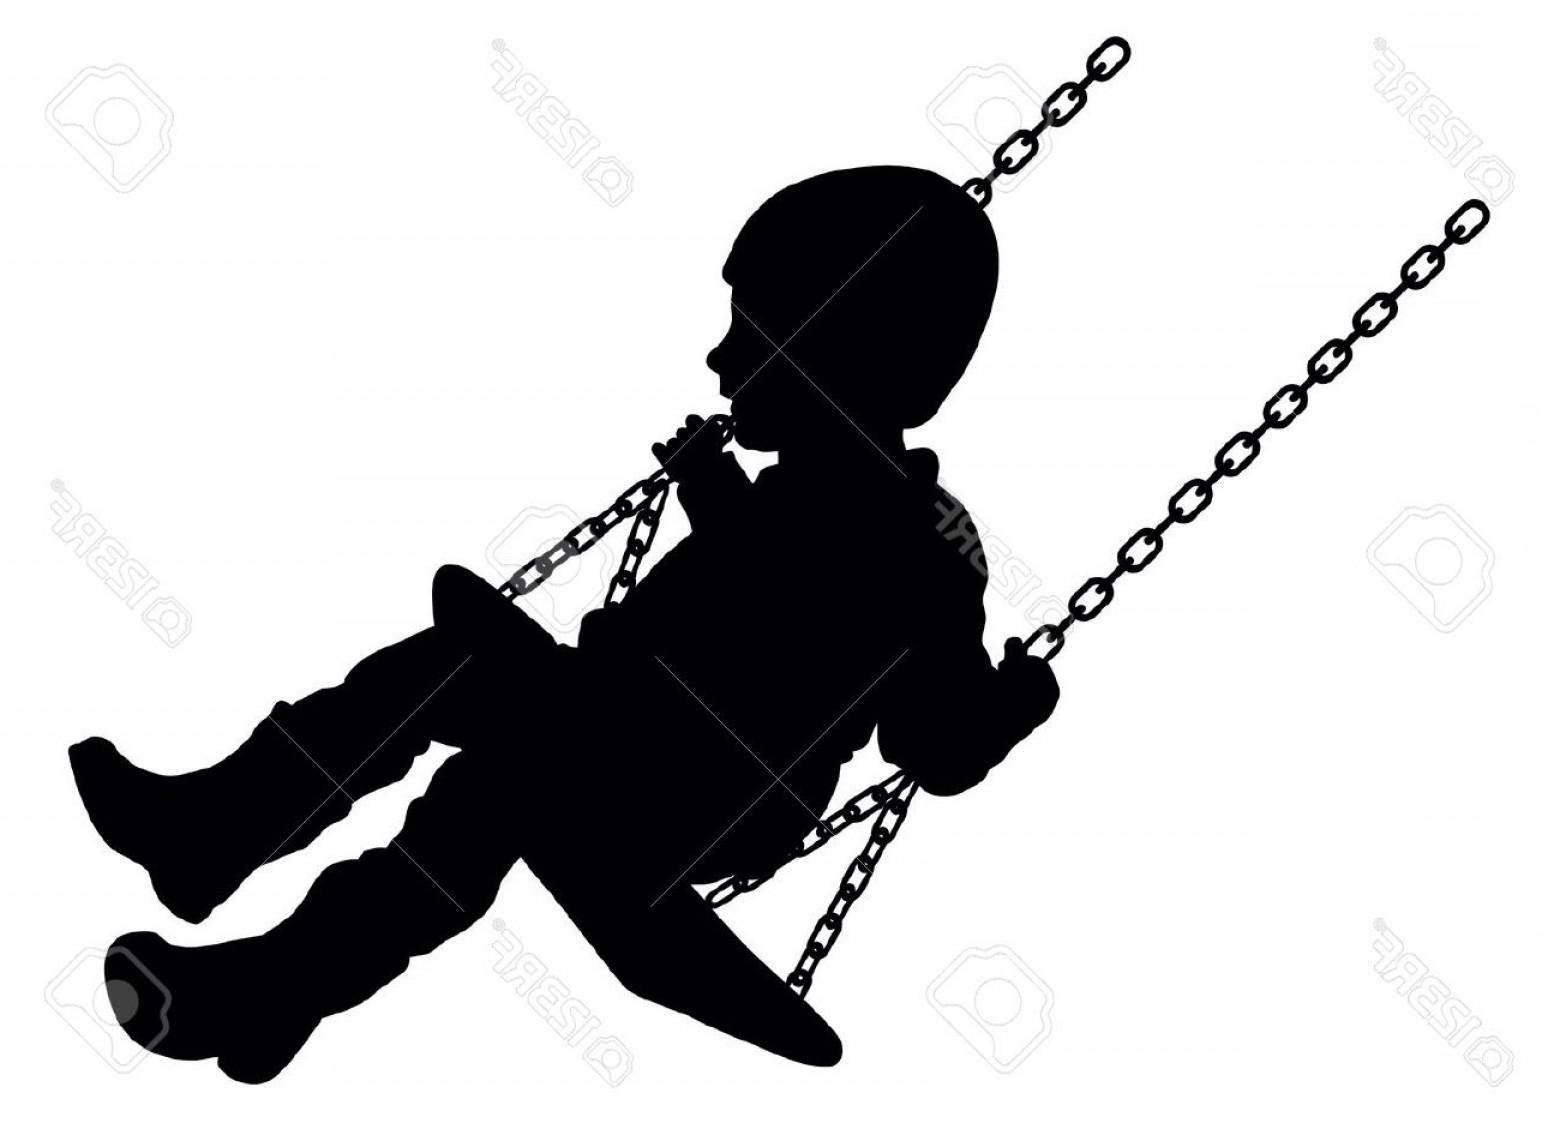 1560x1129 Photostock Vector Vector Illustration Of Swinging Child Silhouette